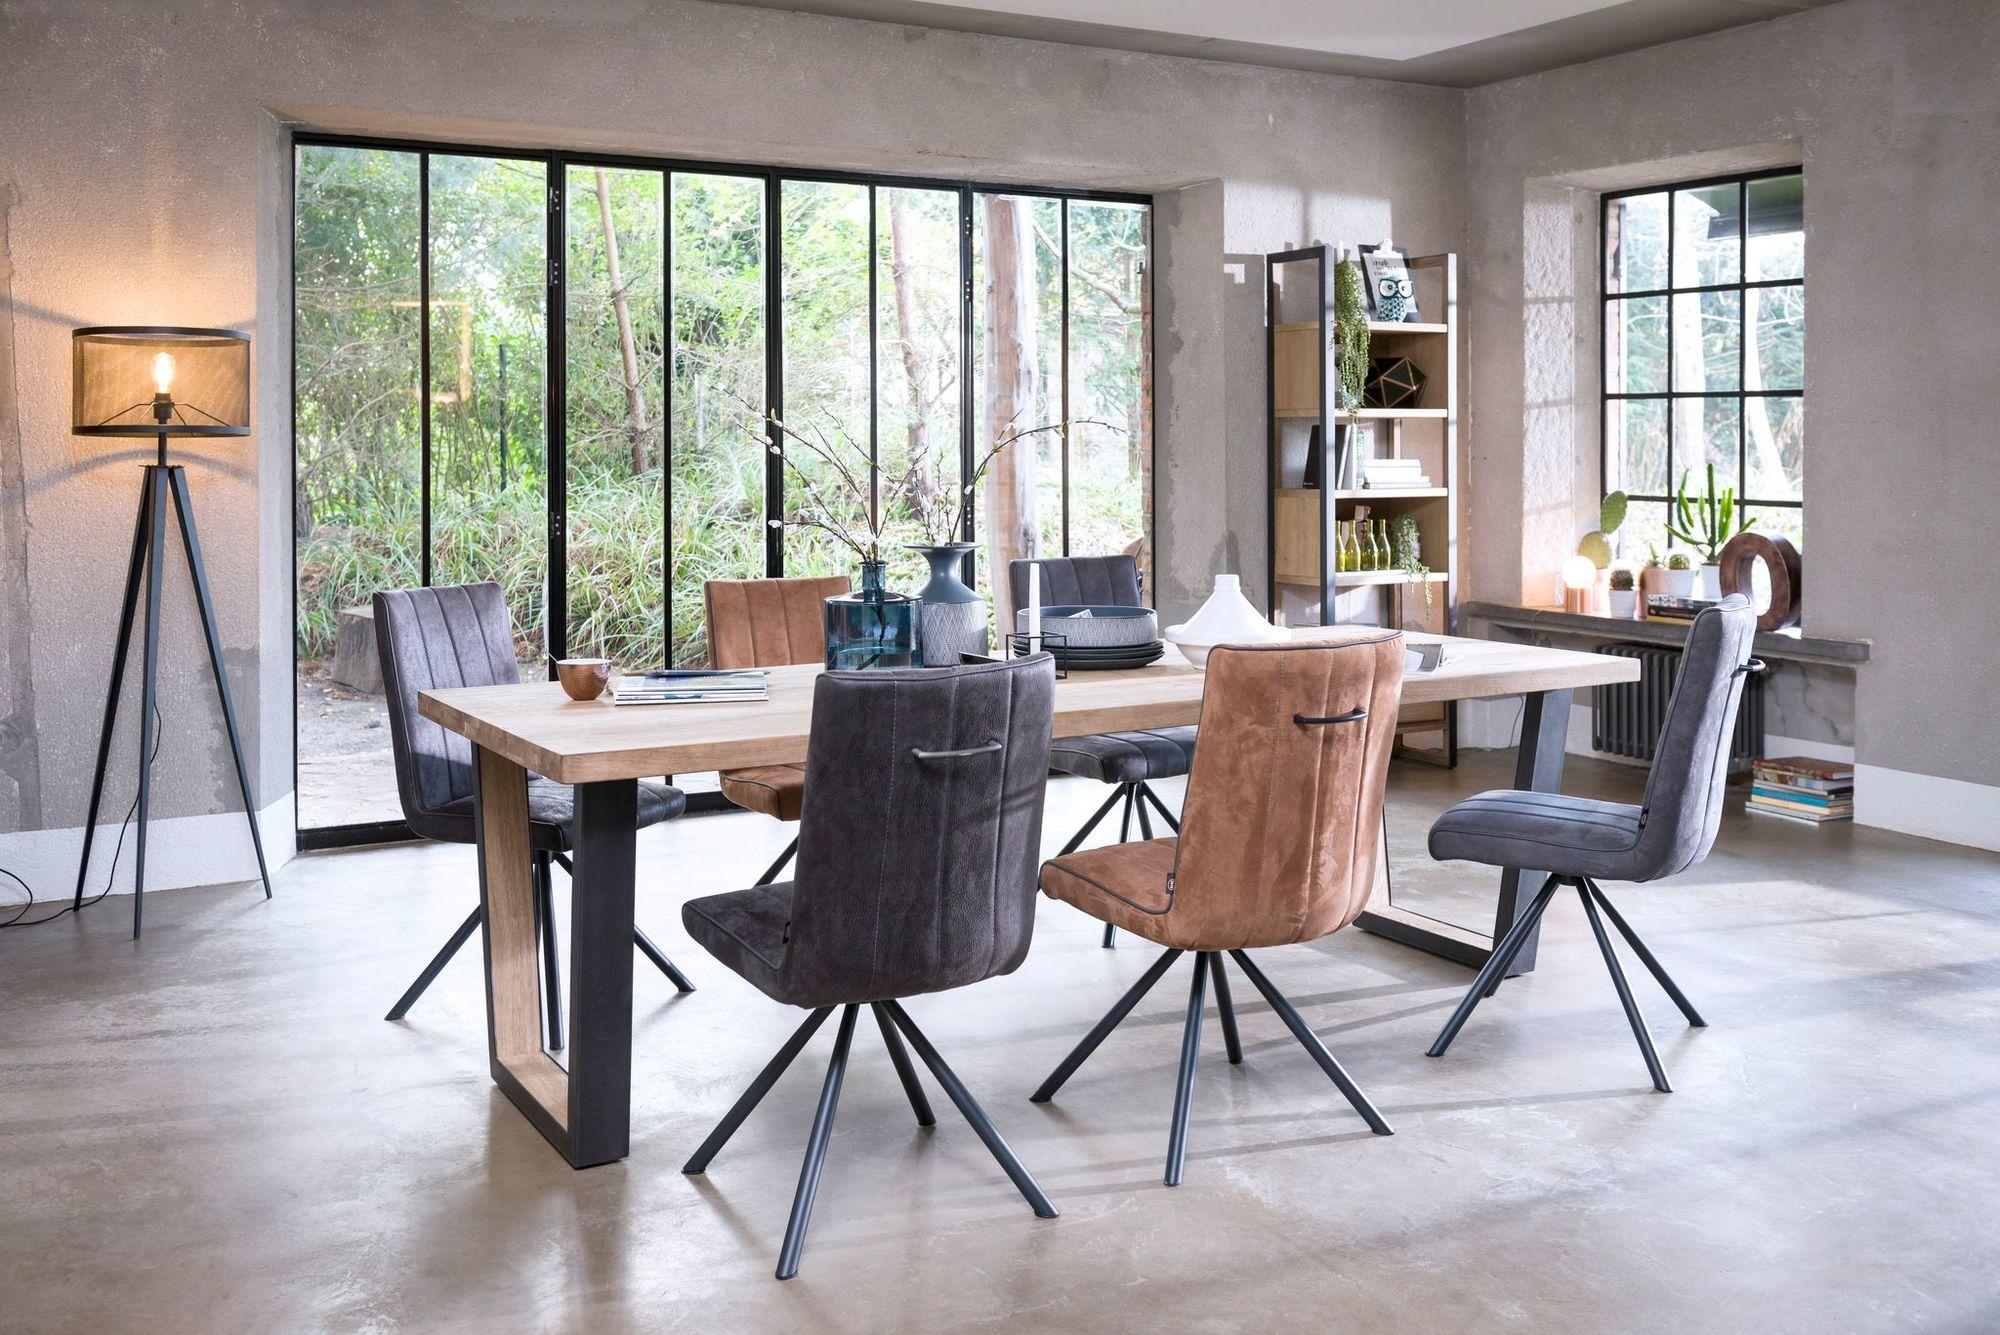 5 astonishing dining room decor ideas dining room decor ideas 5 Astonishing Dining Room Decor Ideas HH